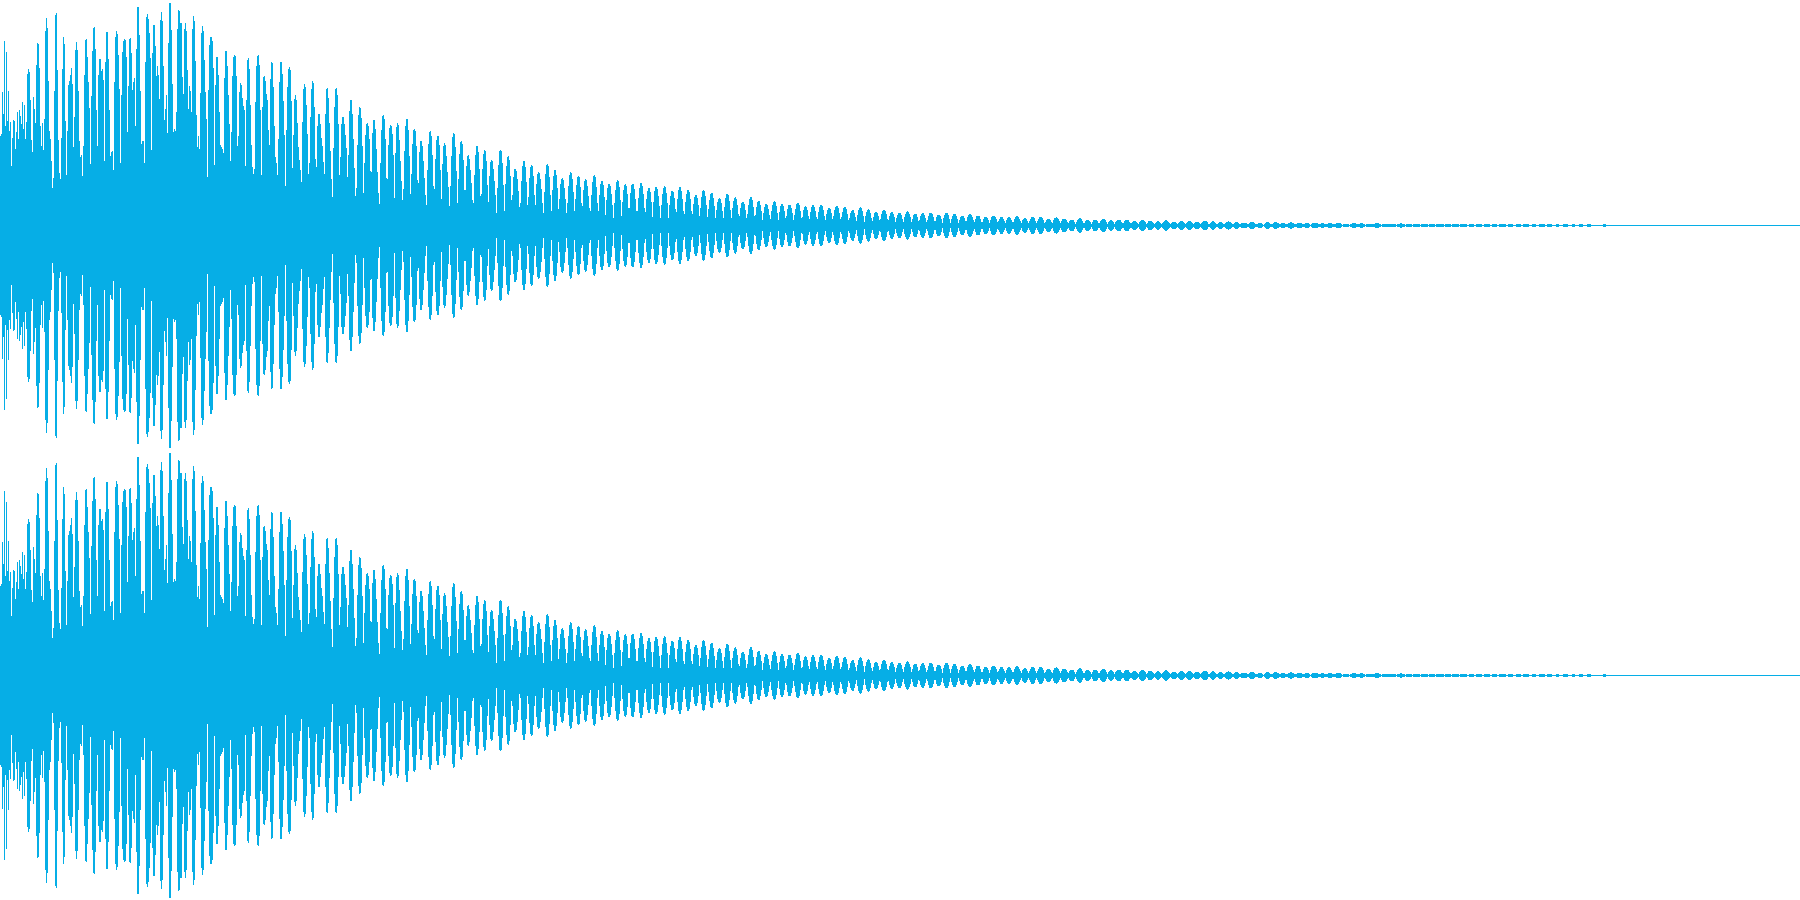 DTM Tom 13 オリジナル音源の再生済みの波形